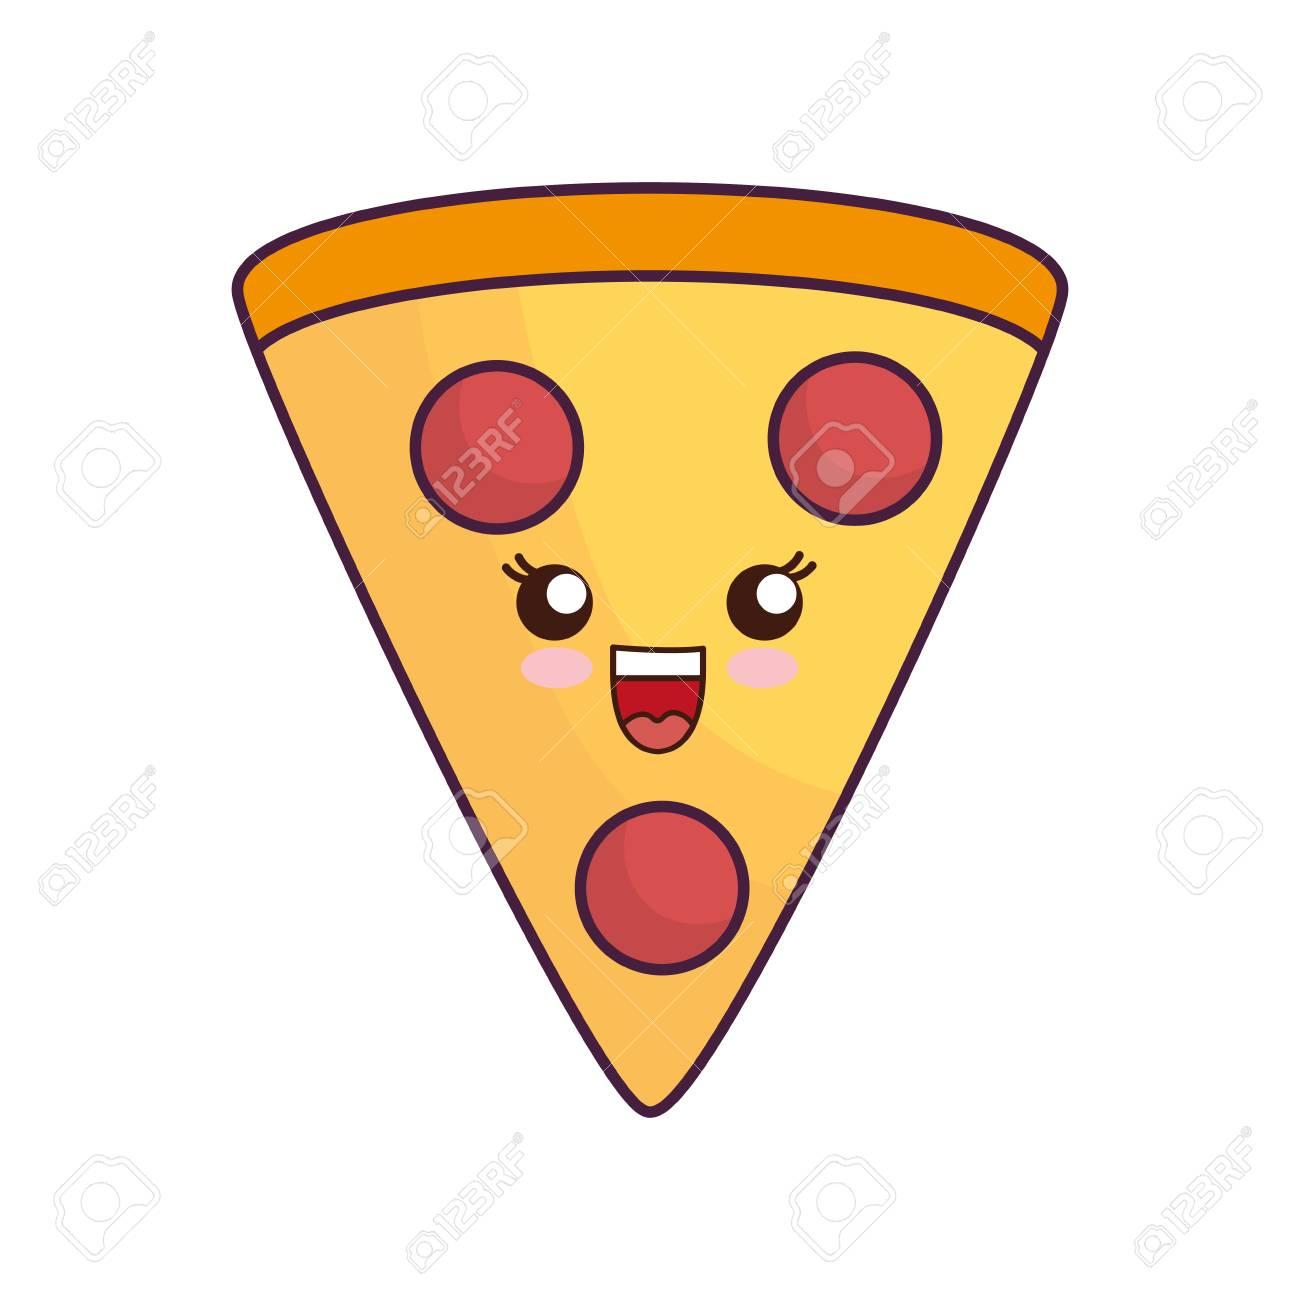 Kawaii Pizza Slice Icon Over White Background Vector Illustration